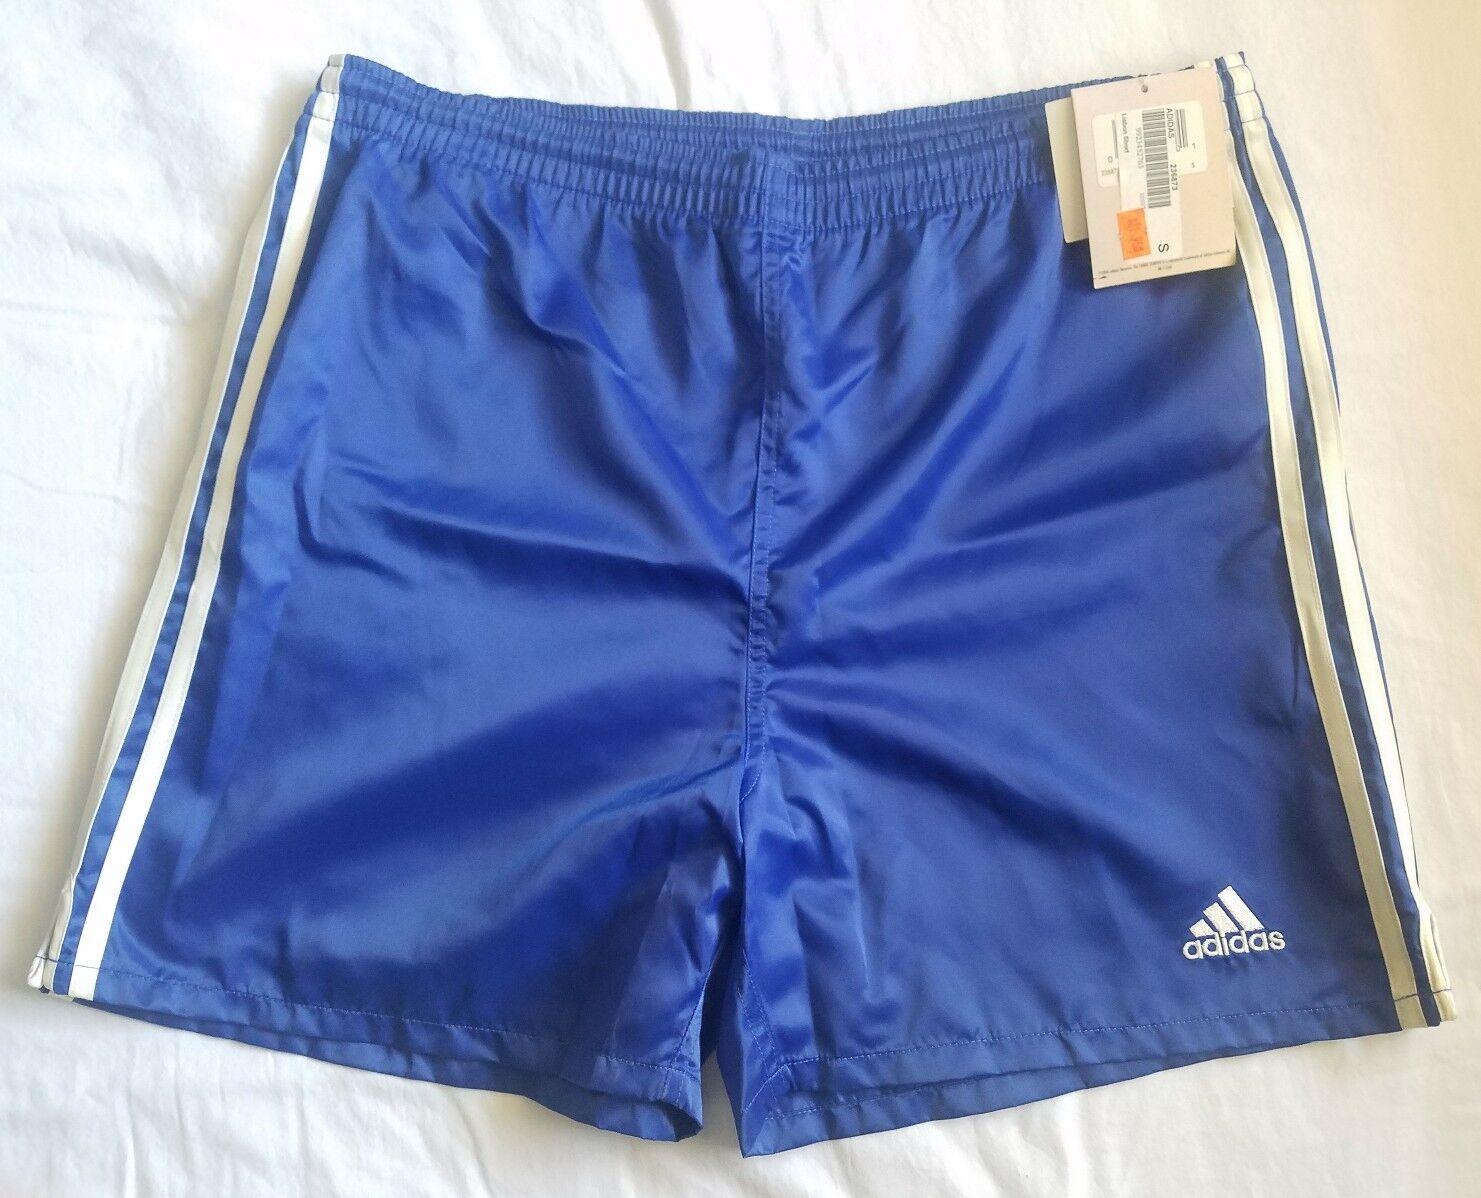 Vtg Adidas  Lisbon Glanz Nylon Shiny Satin Soccer Shorts New With Tags Small  hastened to see